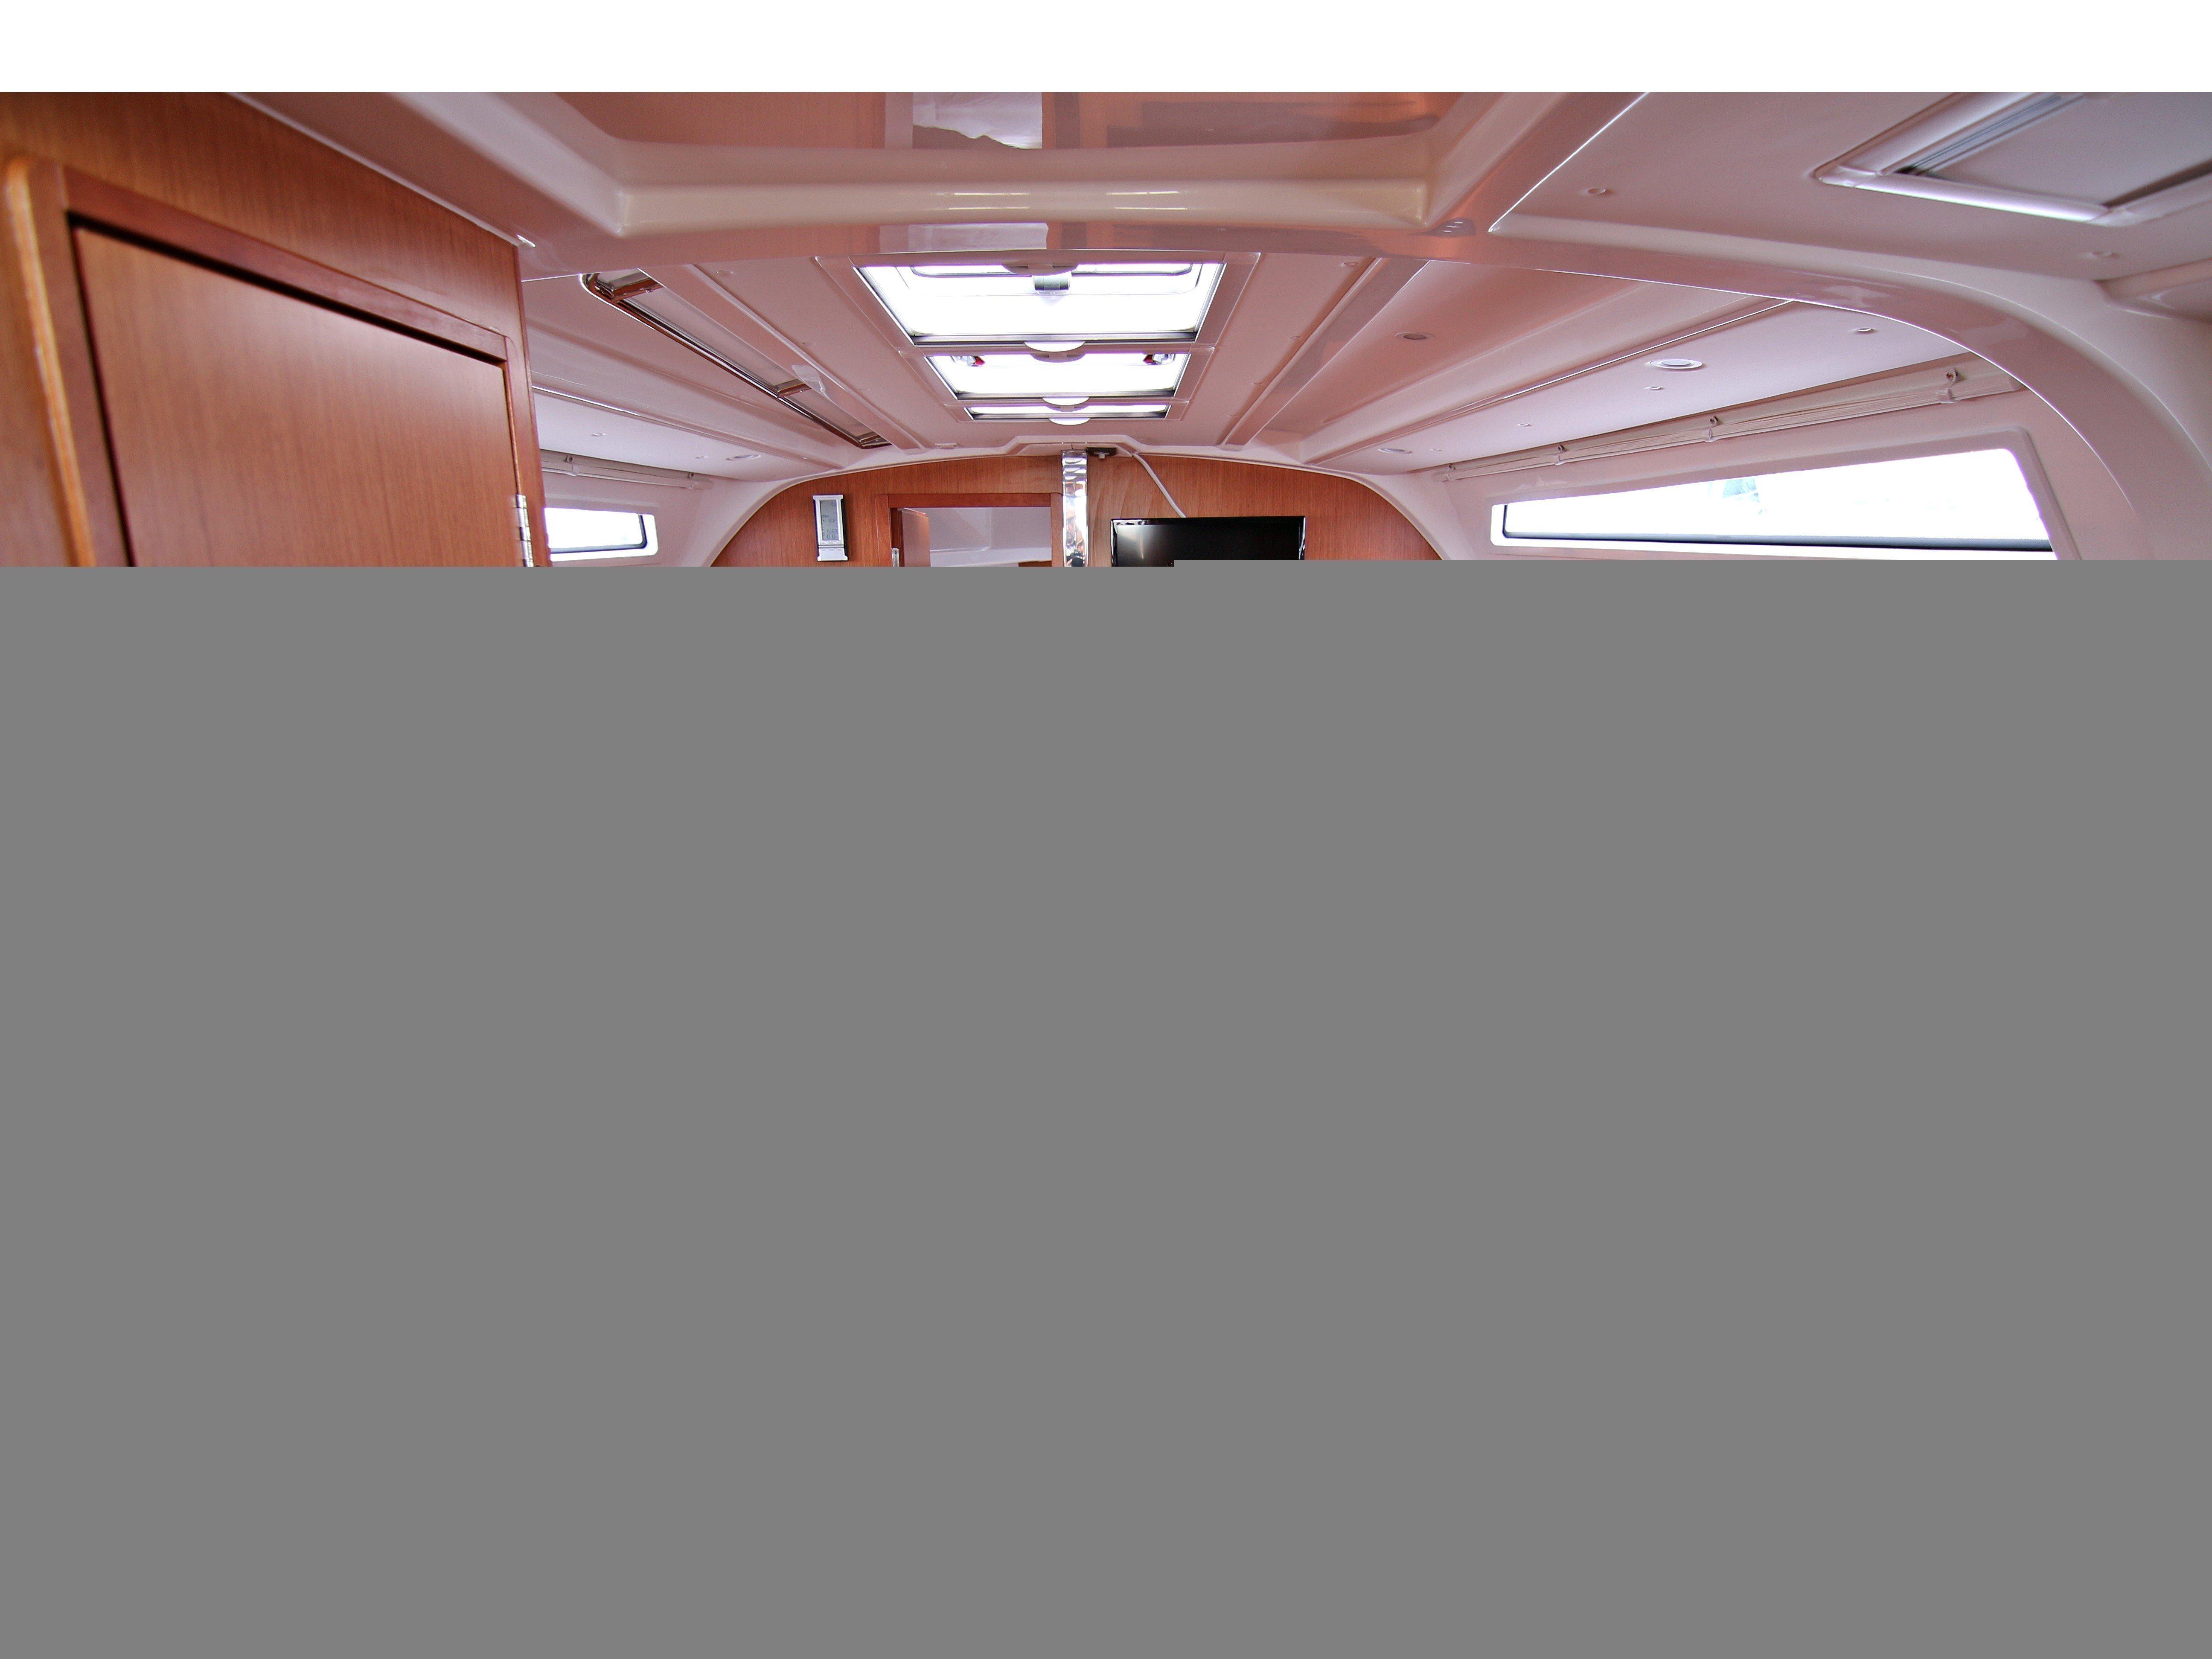 BAVARIA C 41 BT (PATRIZIA) Interior image - 17